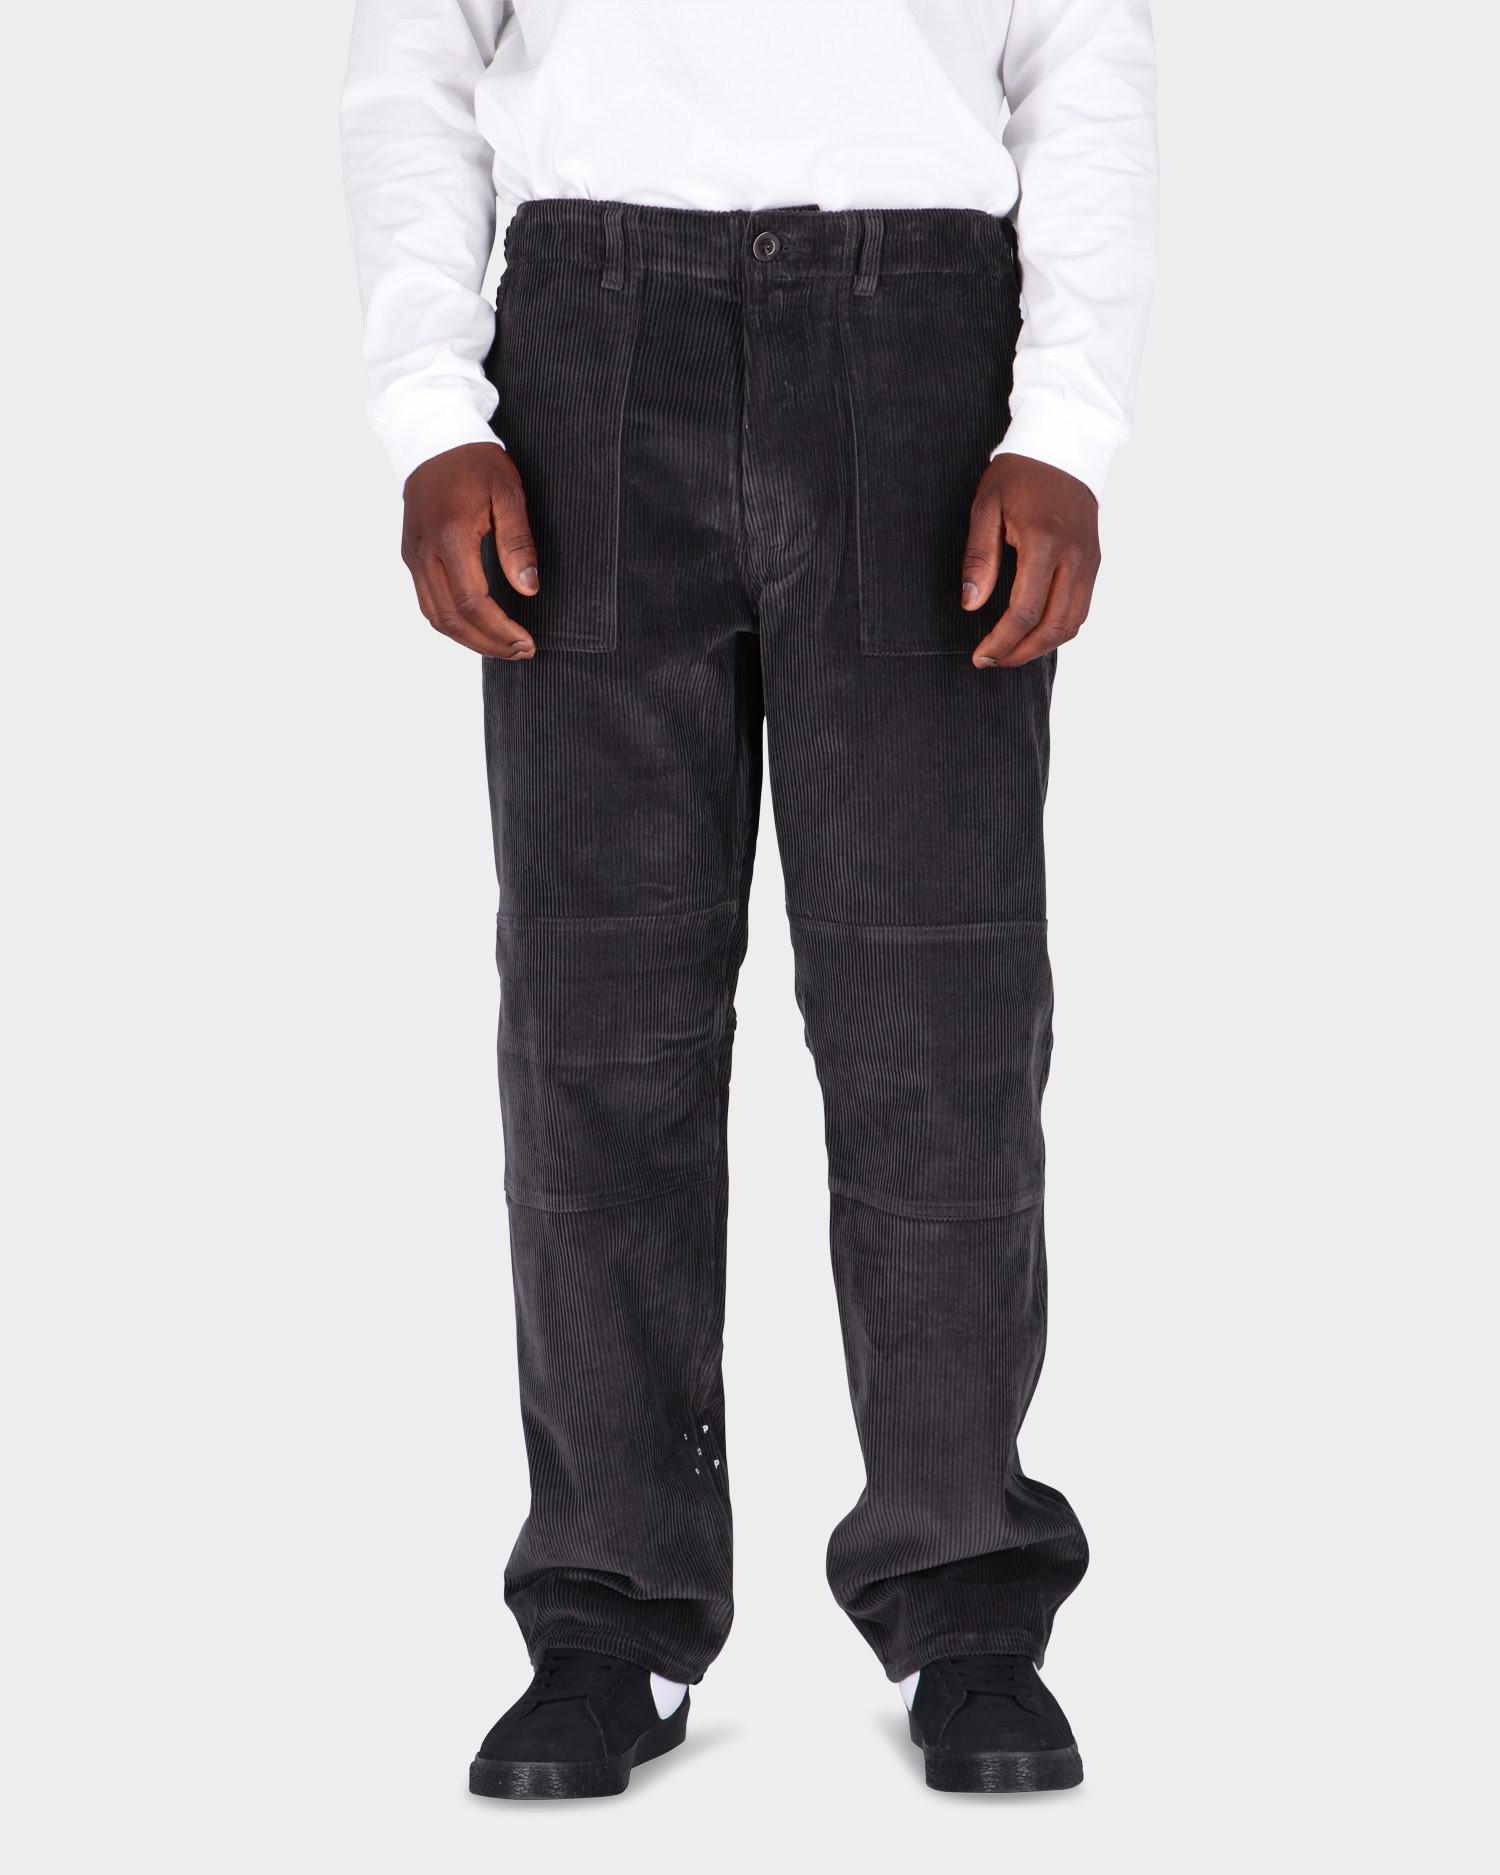 Pop Trading Co Phatigue Farm Pants Charcoal